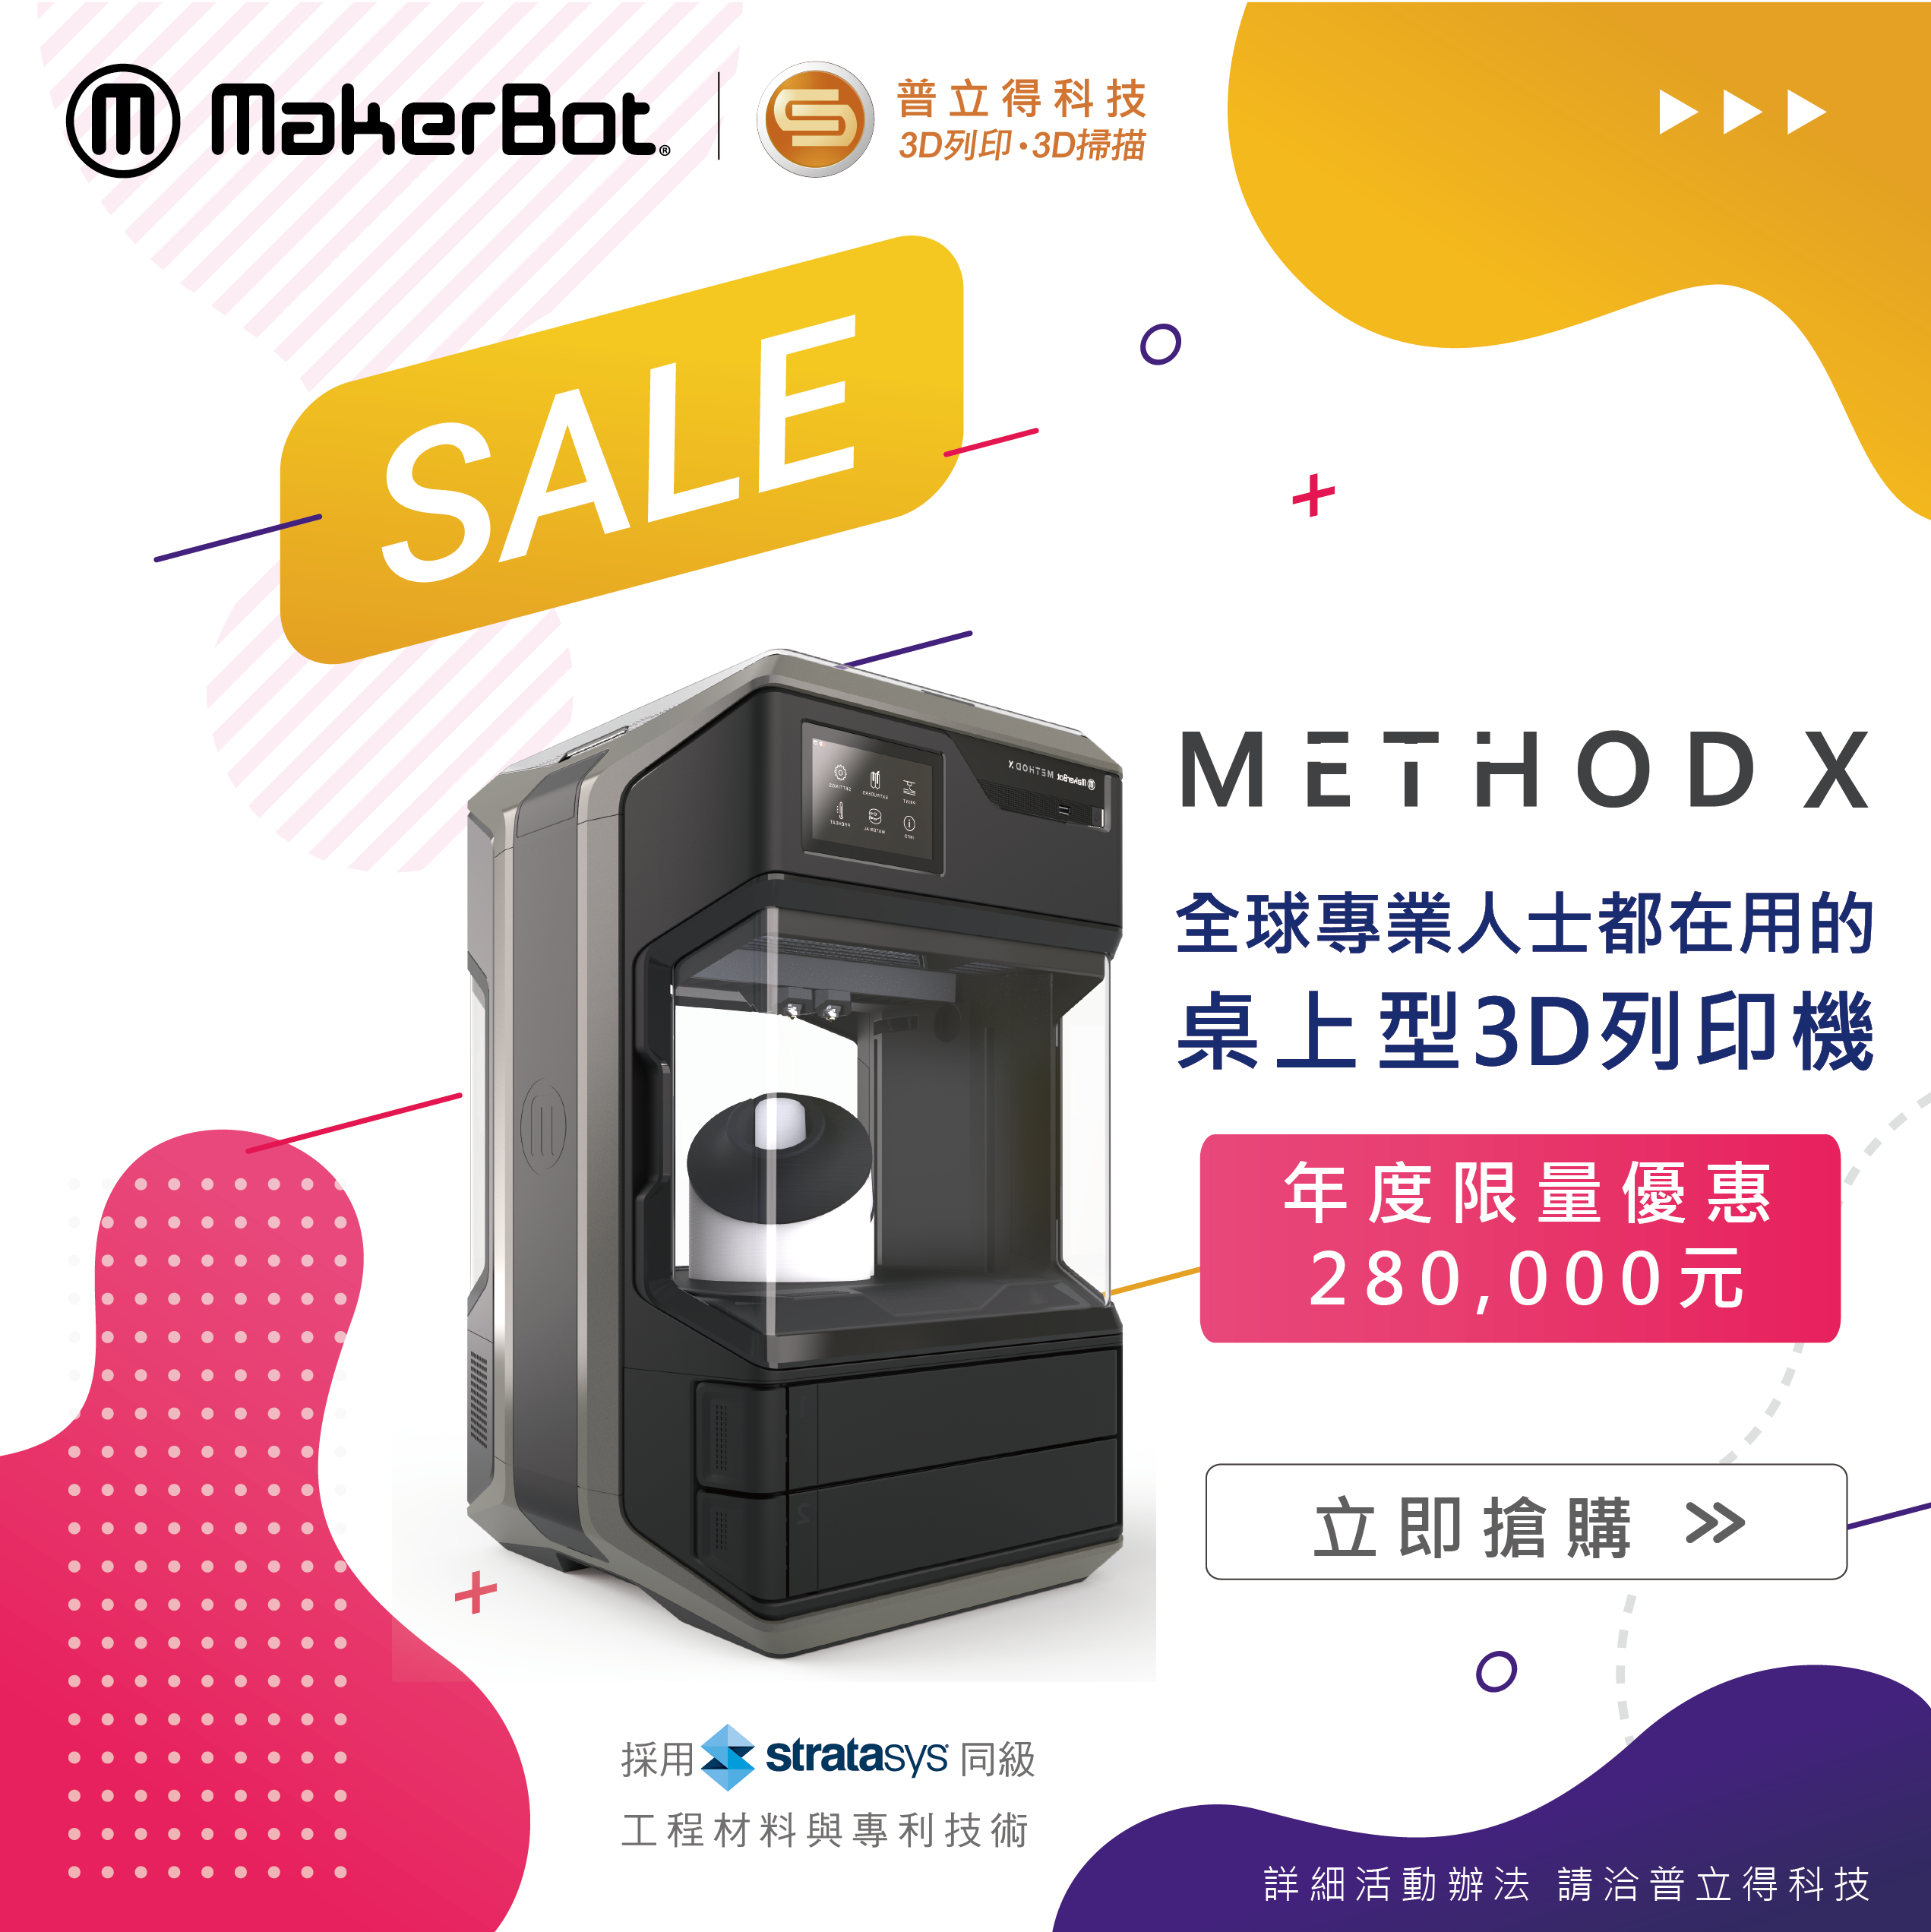 Makerbot- METHOD X工業級3D列印機,不只PLA,給您列印真正工業塑料的選擇!更穩定的列印物件品質!